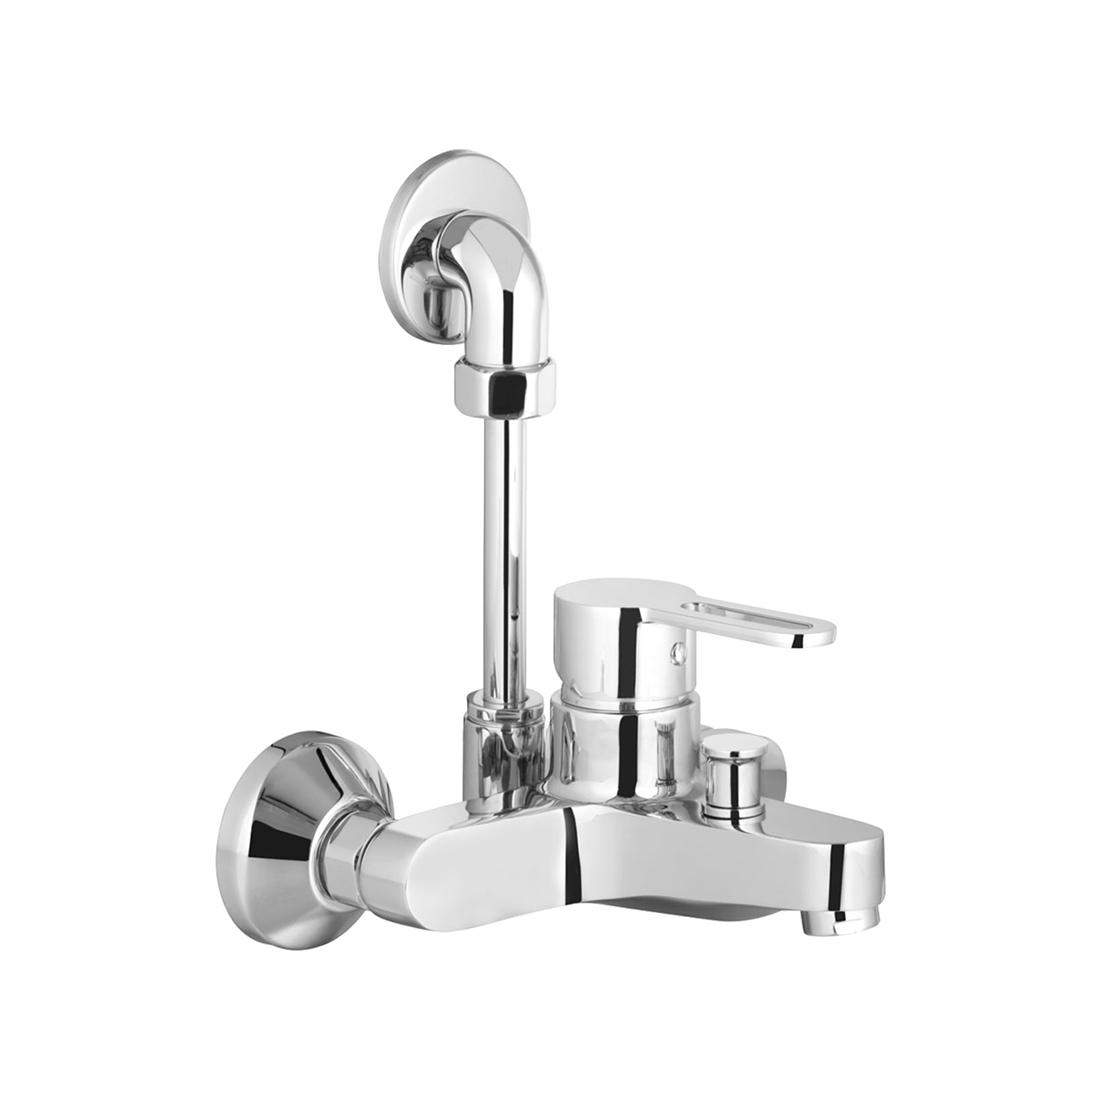 Kerovit Curve KB1711045 Single Lever Bath and Shower Mixer With Over Head Shower Arrangement